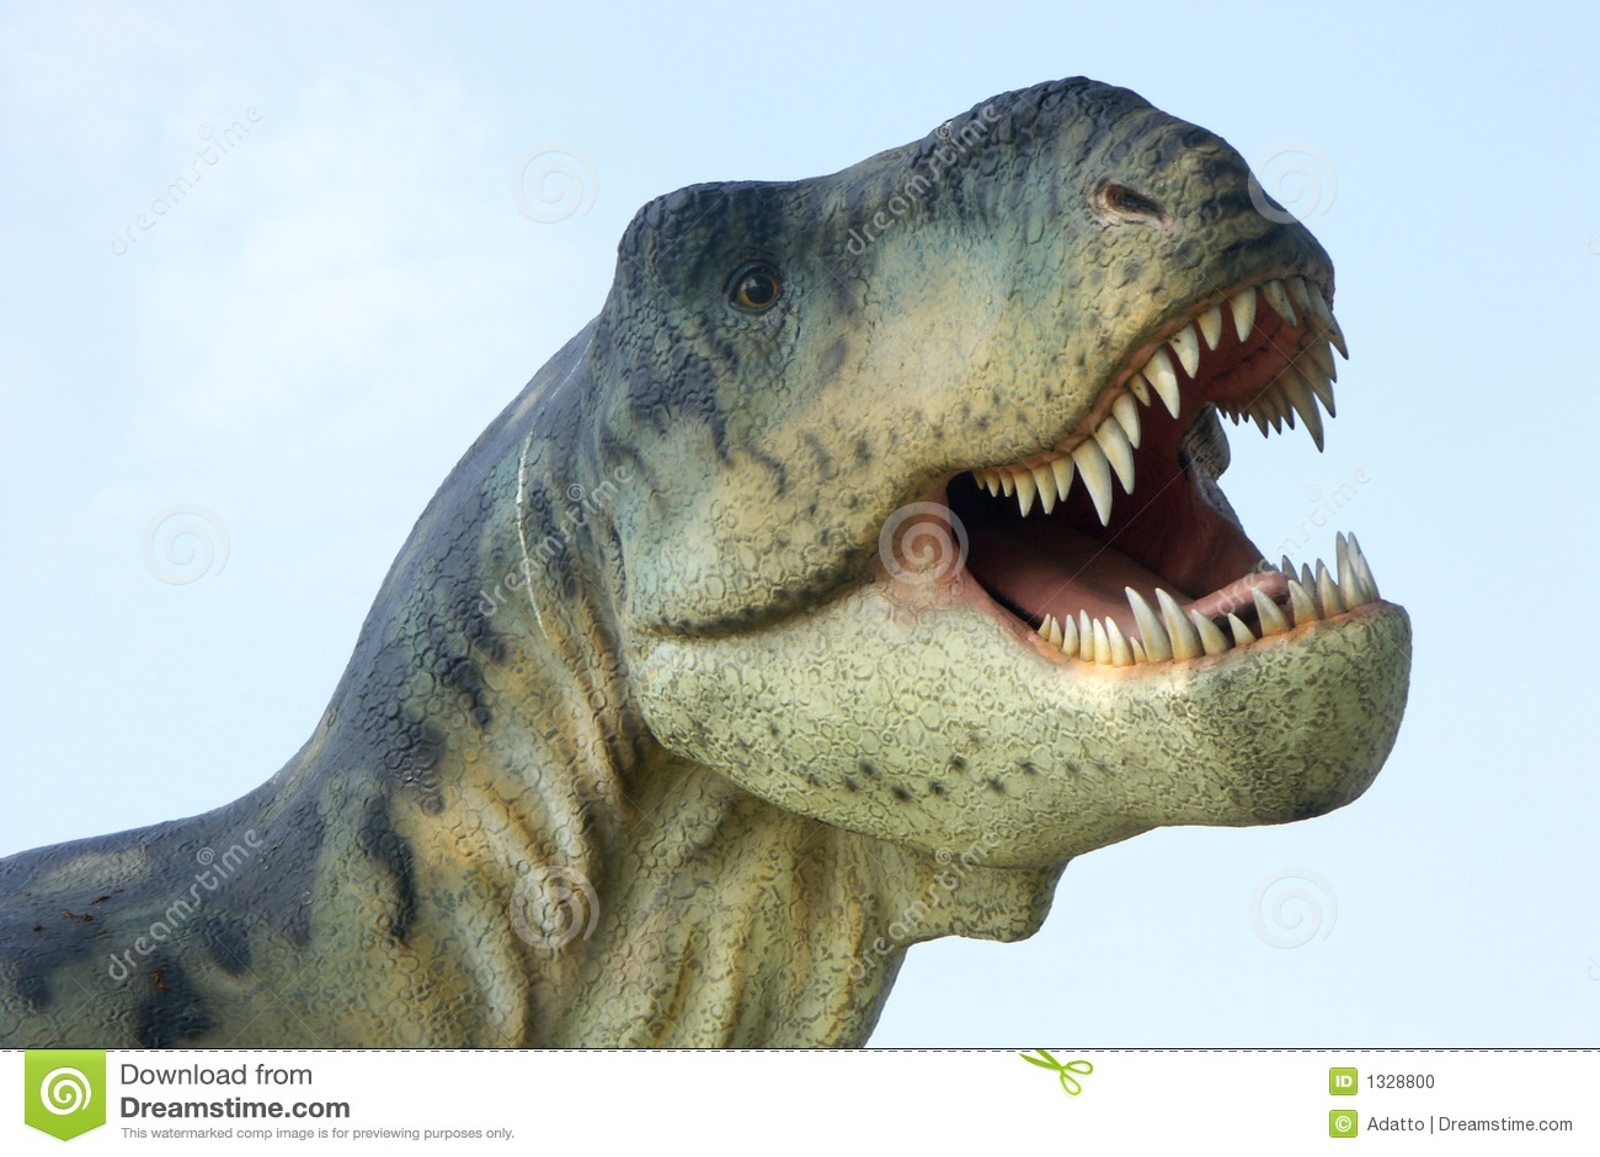 Stock Photo: T-Rex